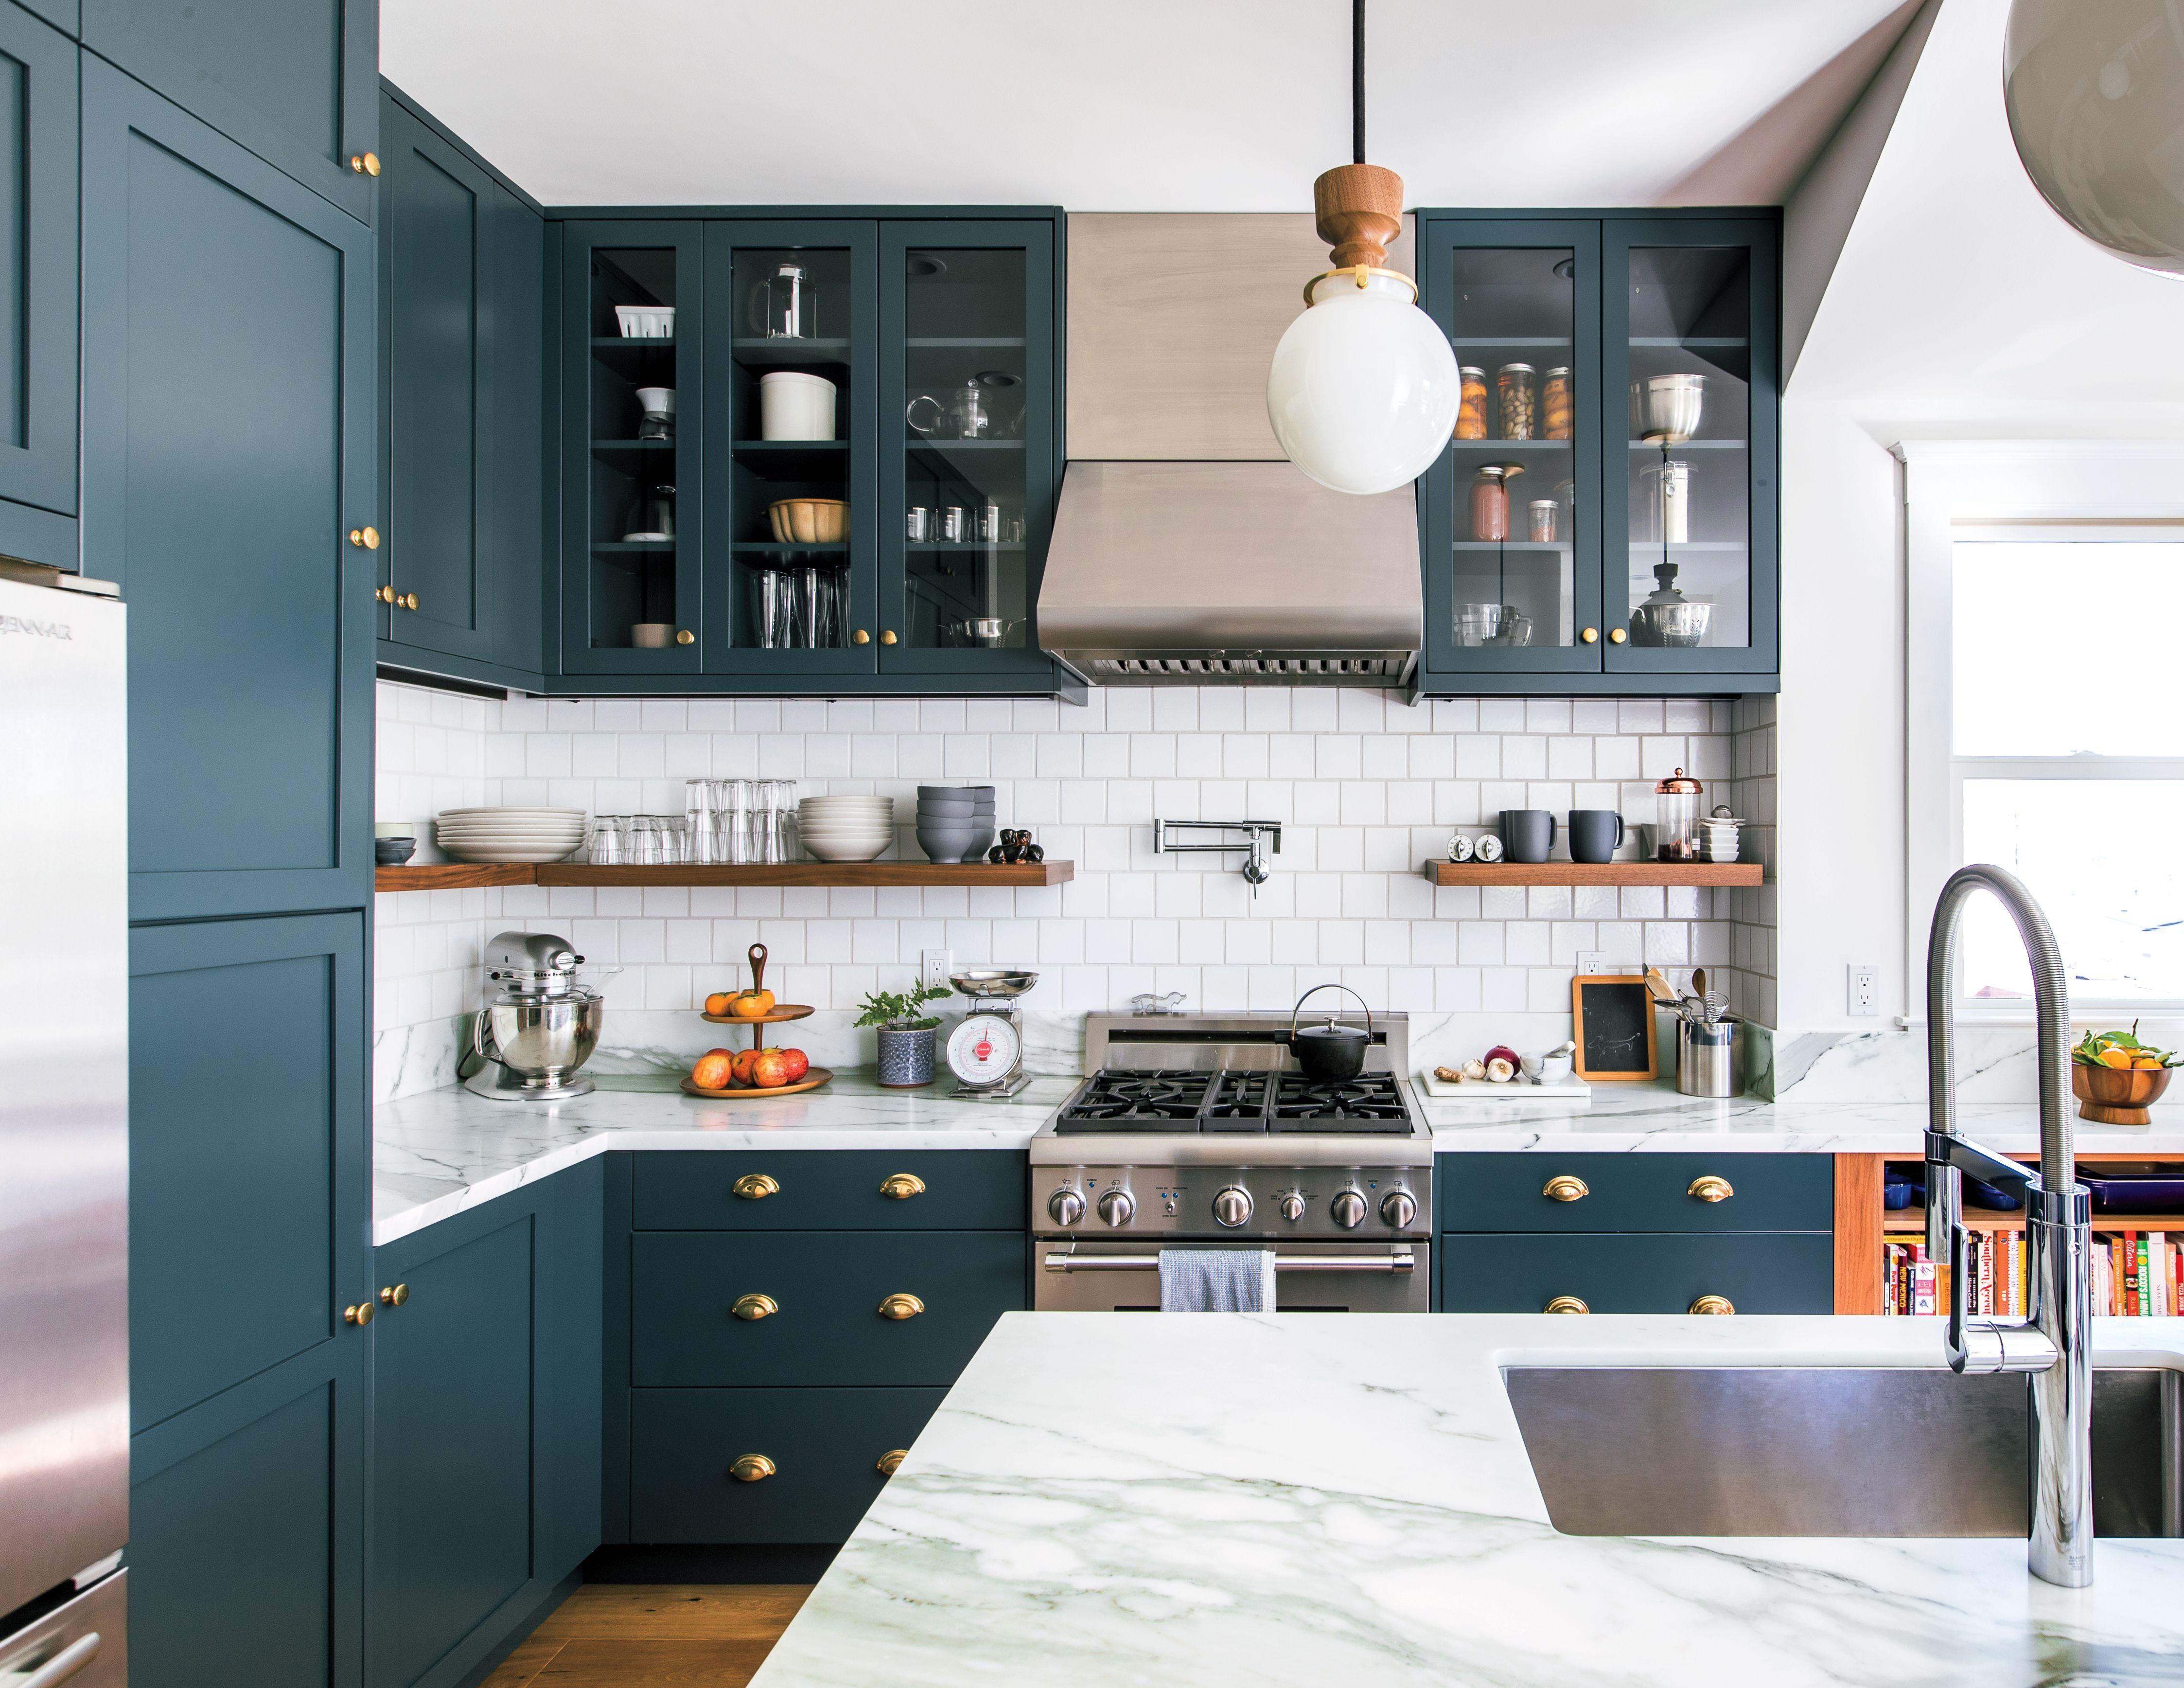 Photo of Green Cabinets Make This Edwardian Kitchen Renovation Shine | Sunset